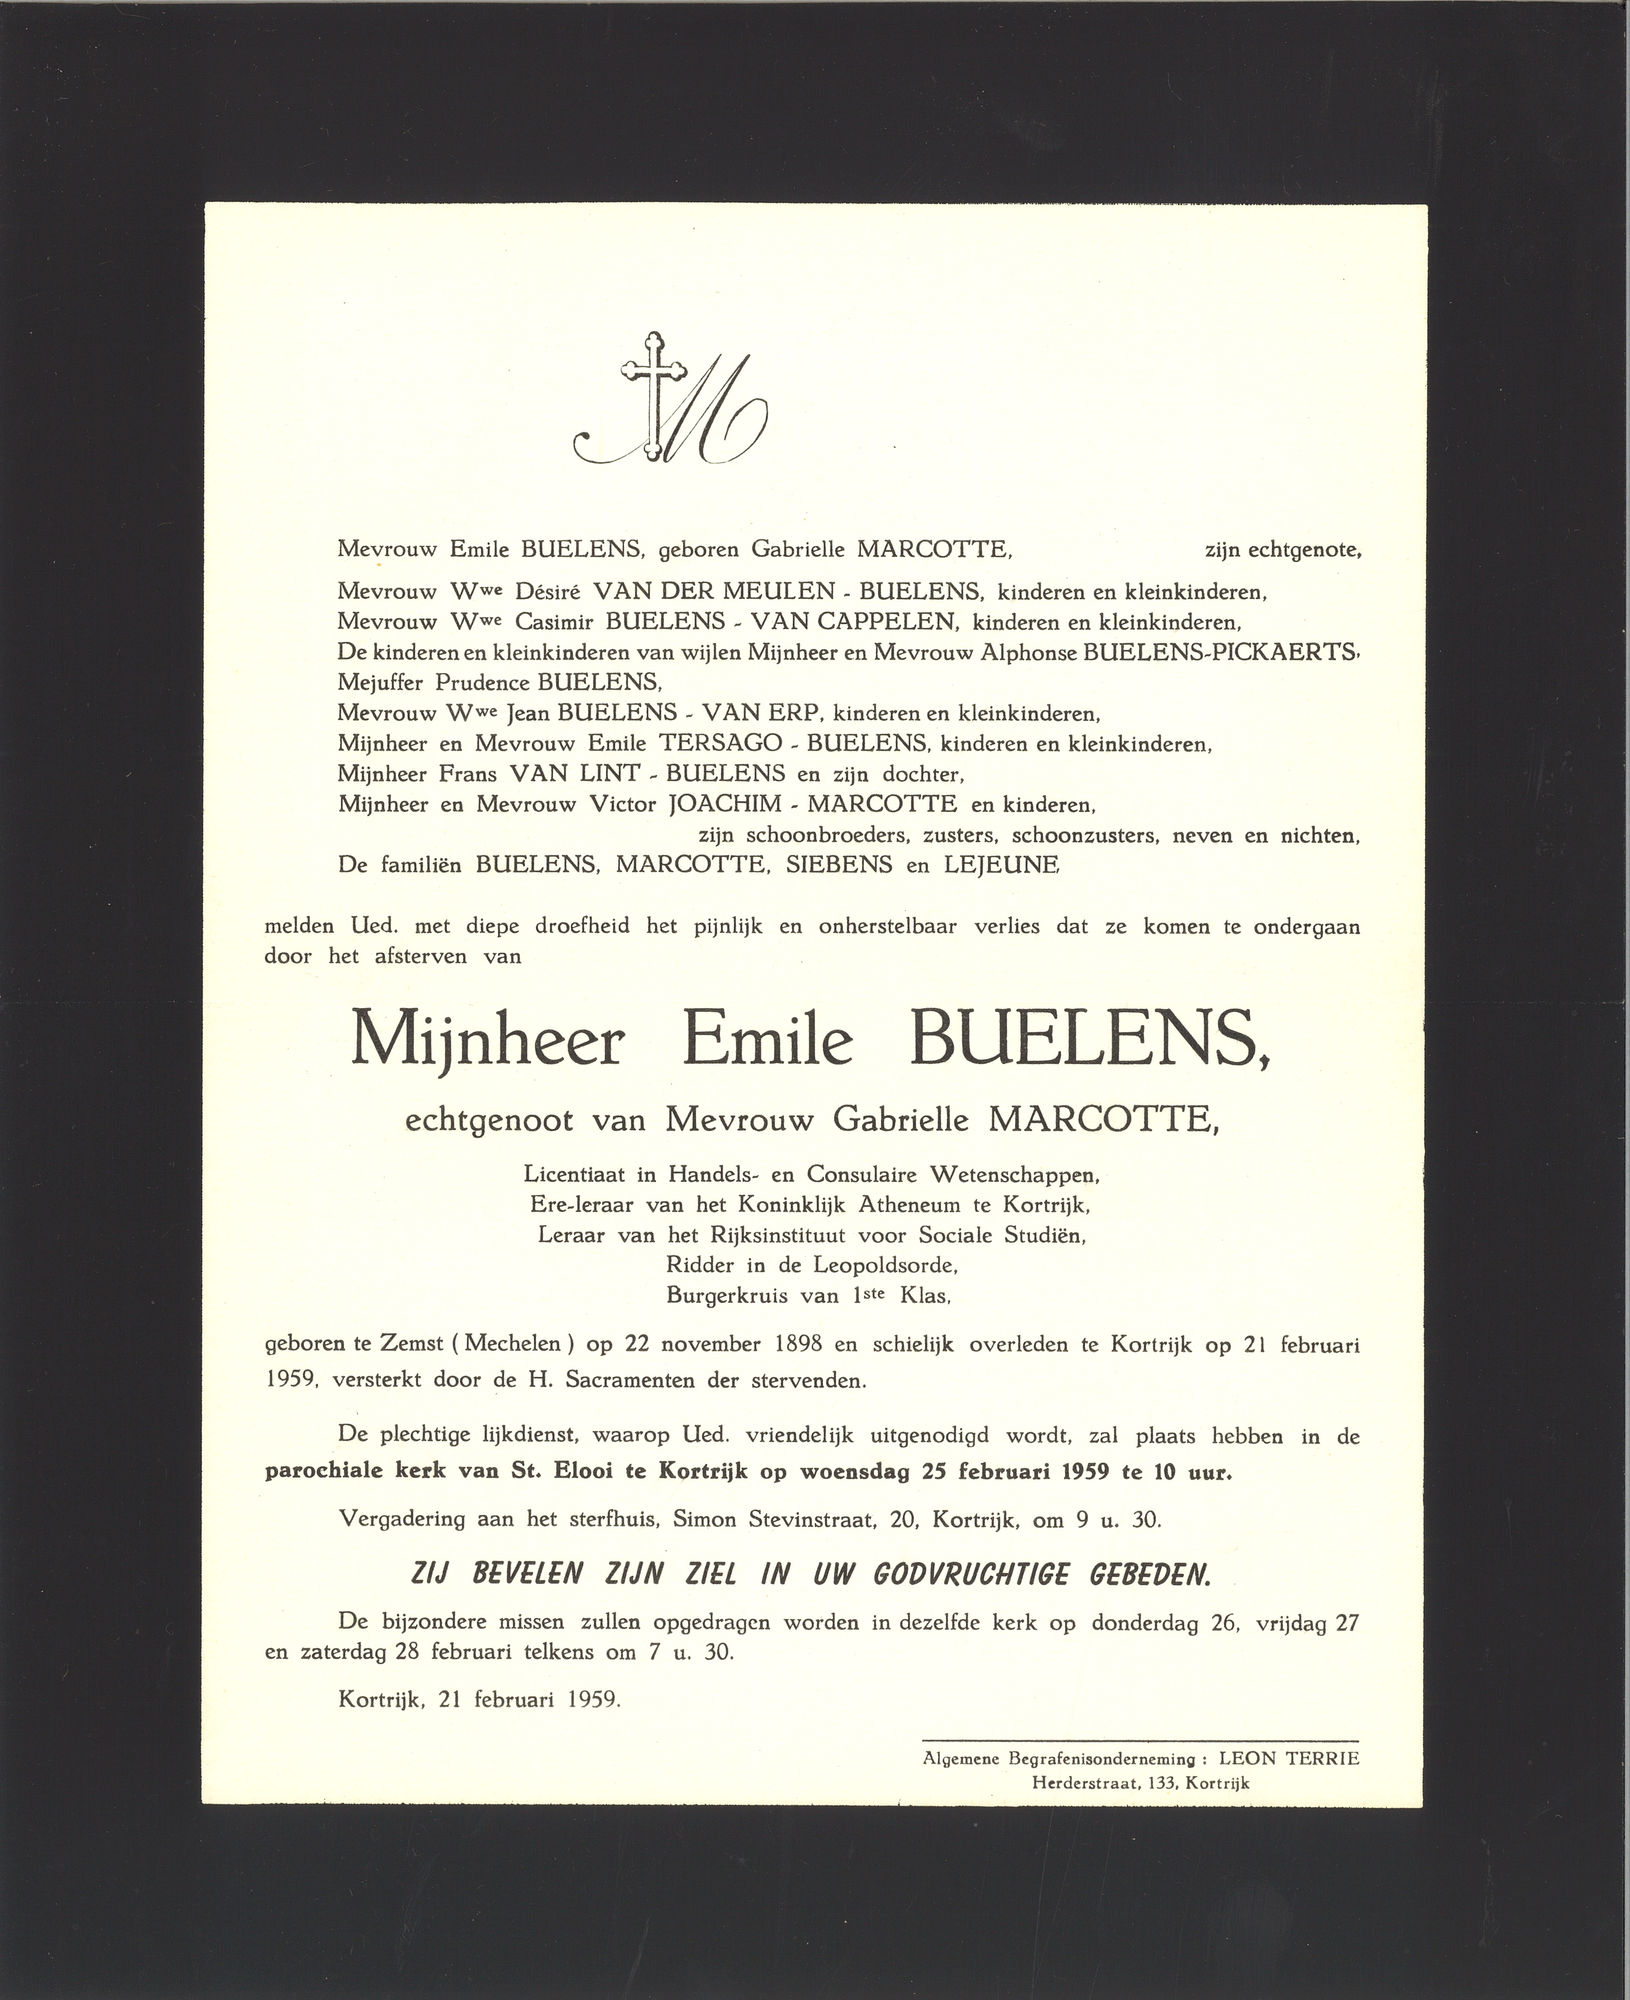 Emile Buelens